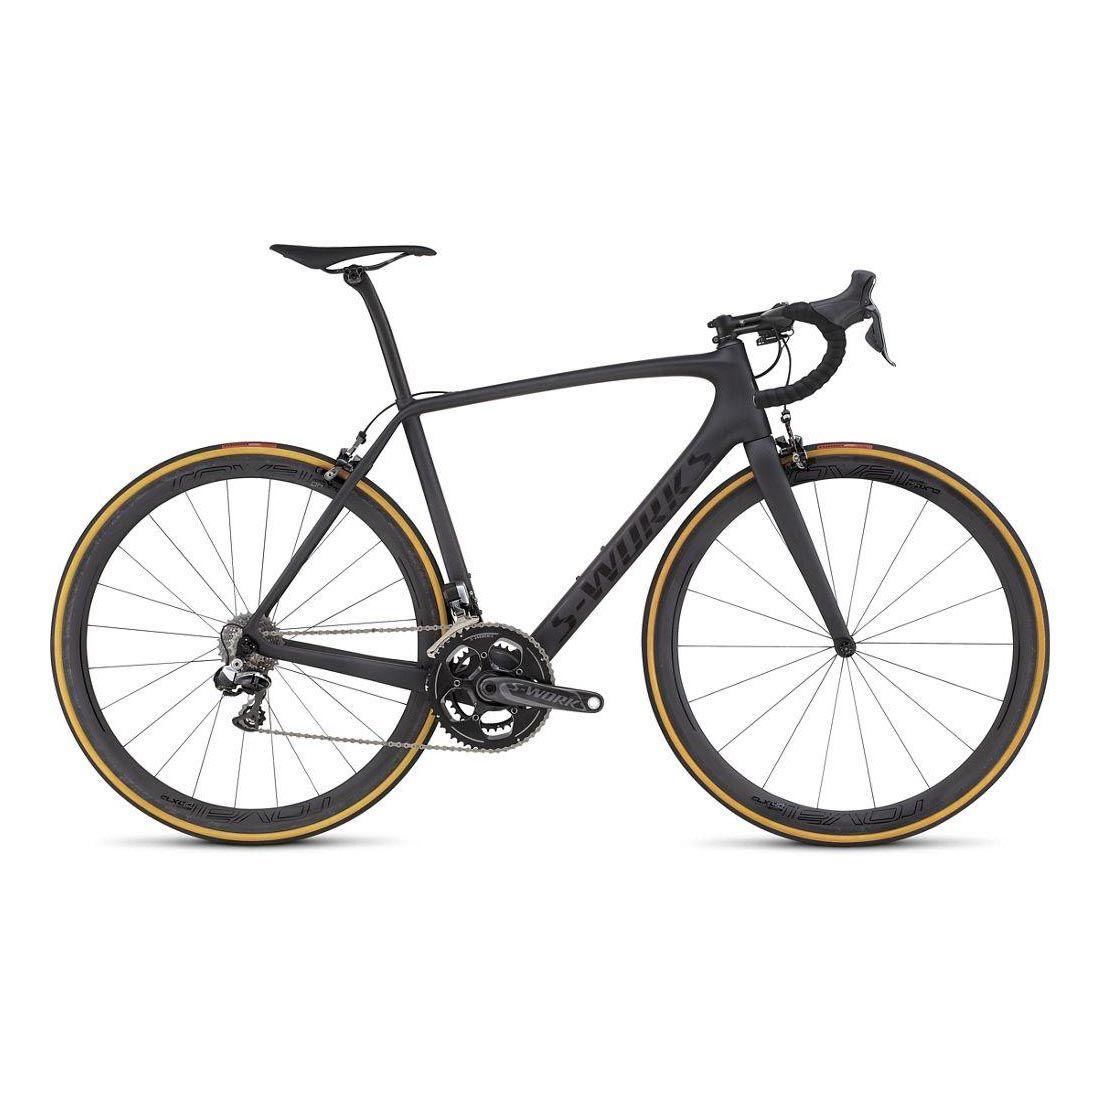 Specialized S Works Tarmac Di2 2016 Road Bike Road Bikes Road